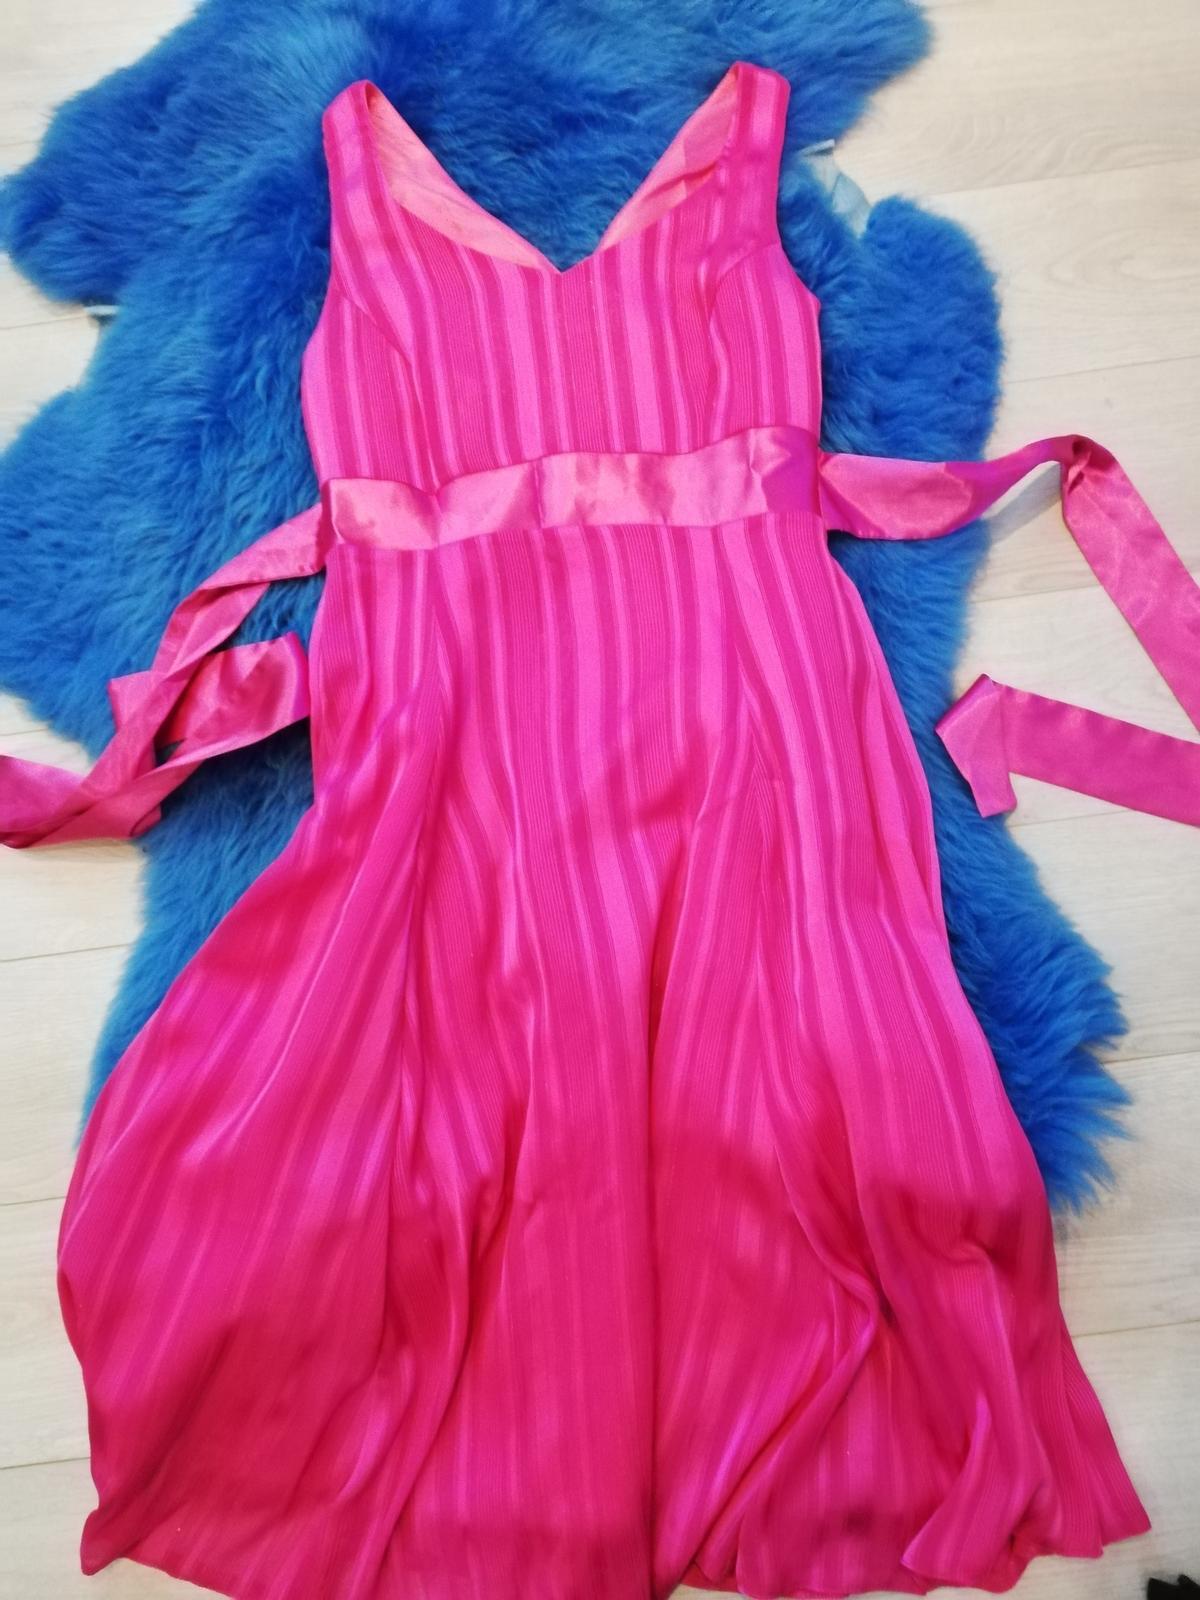 Cyklaménové šaty  - Obrázok č. 1